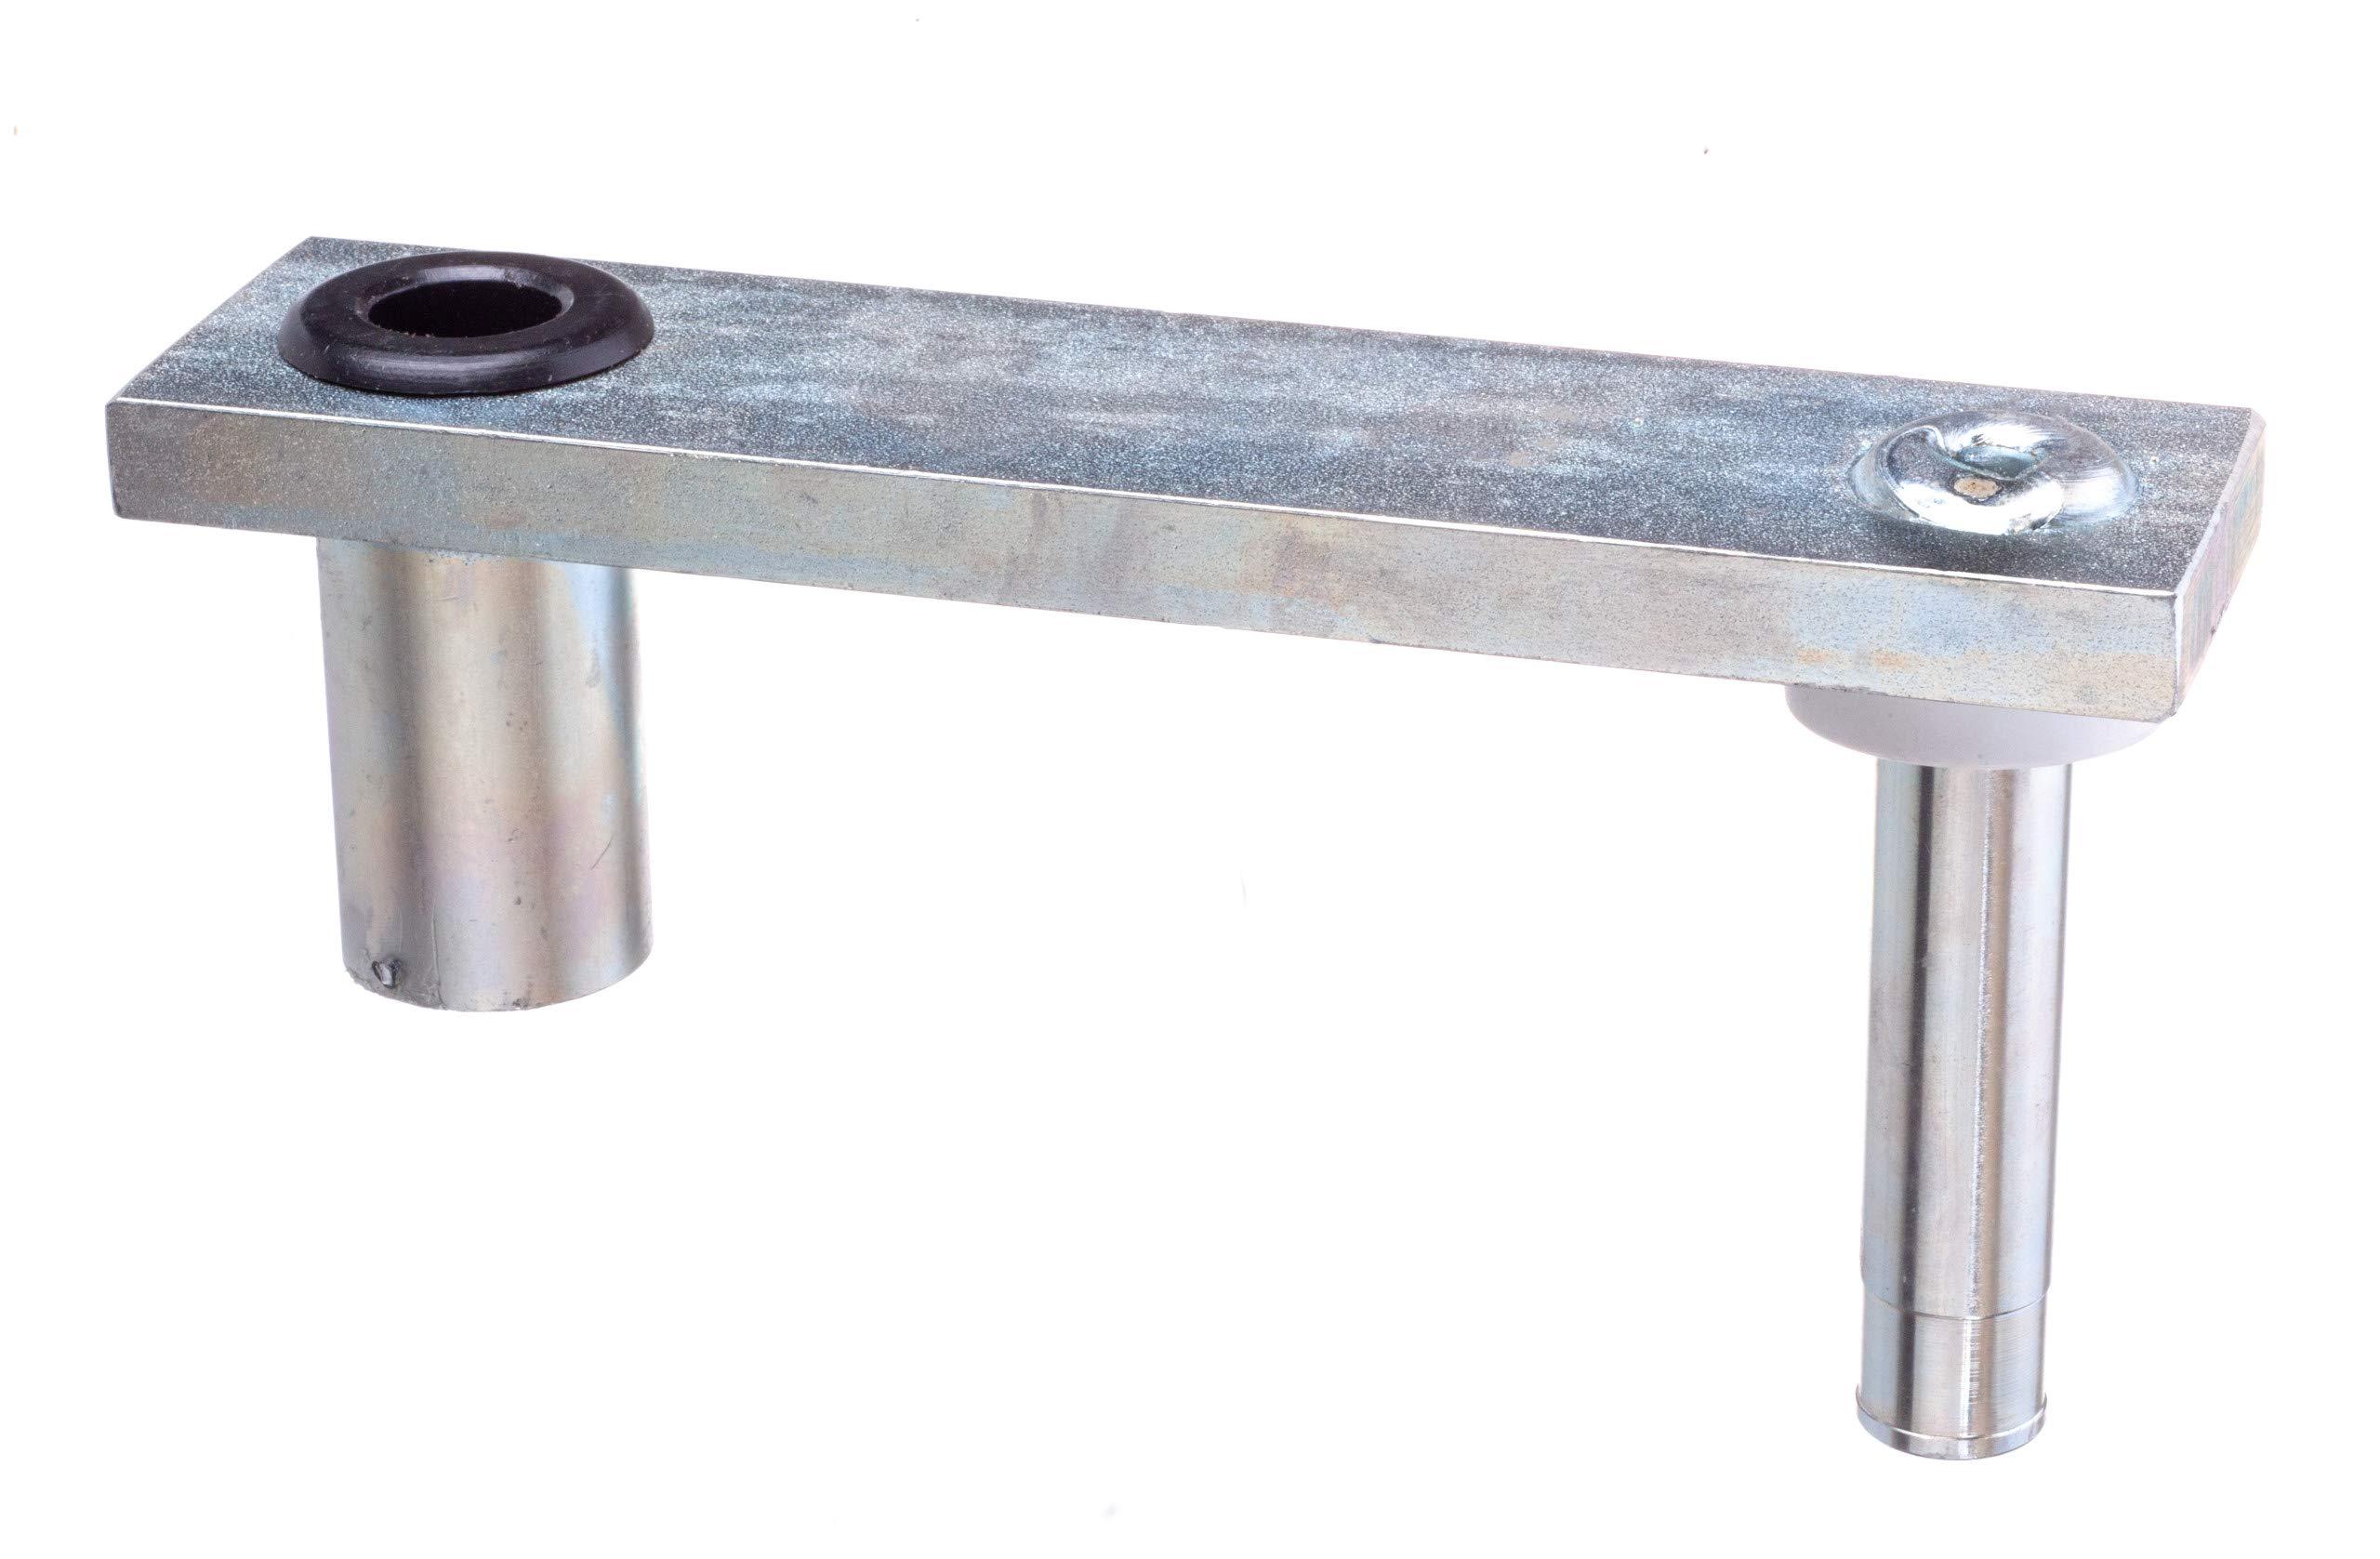 attwood 7062-3 Swivl-Eze Zinc-Plated Steel 6-Inch Swivel Offset Marine Boat Seat Mount by Swivl-Eze